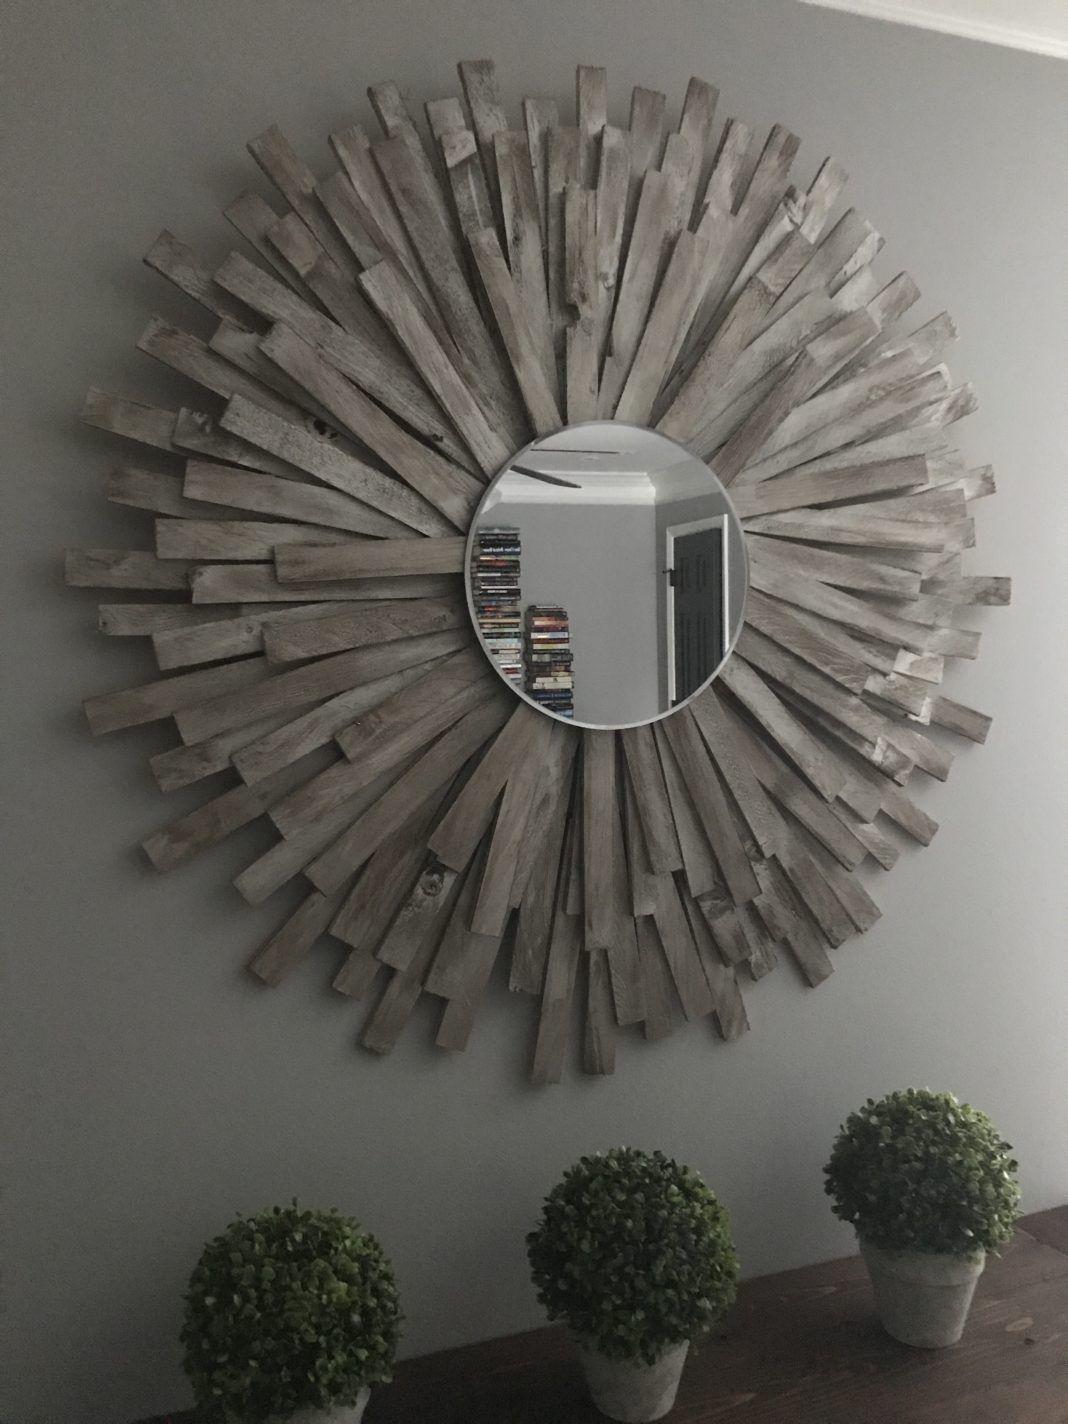 Sunburst Mirror Diy Cheap And Creative Wall Art With Wood Shims Creative Wall Art Mirror Wall Art Diy Mirror